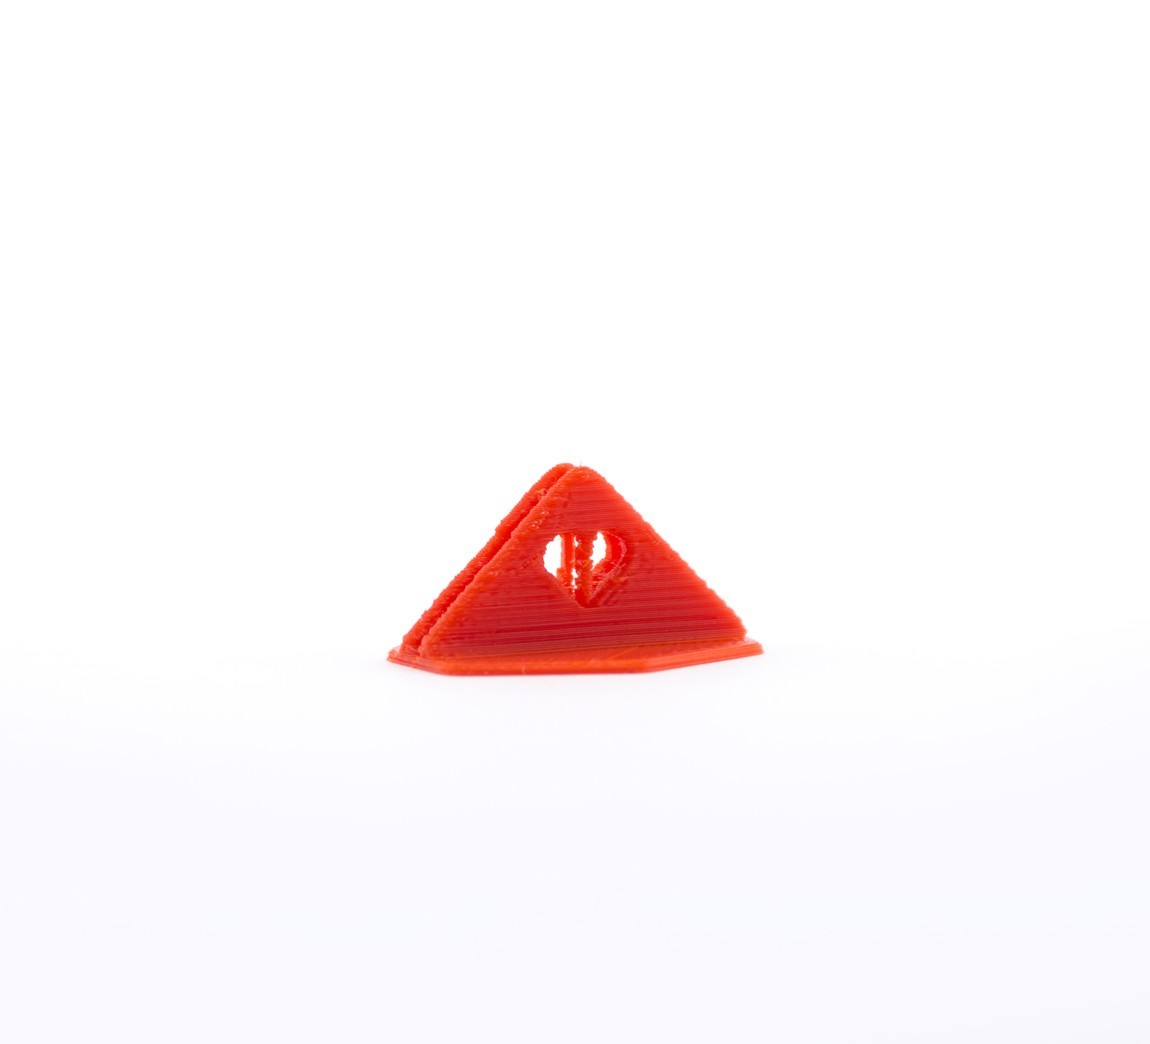 e02827805cd91f769904642ca58aca4a_1447958670923_11.17.15-product-shoot-020.jpg Download free STL file Heart Card Holder • 3D printable design, Hom3d